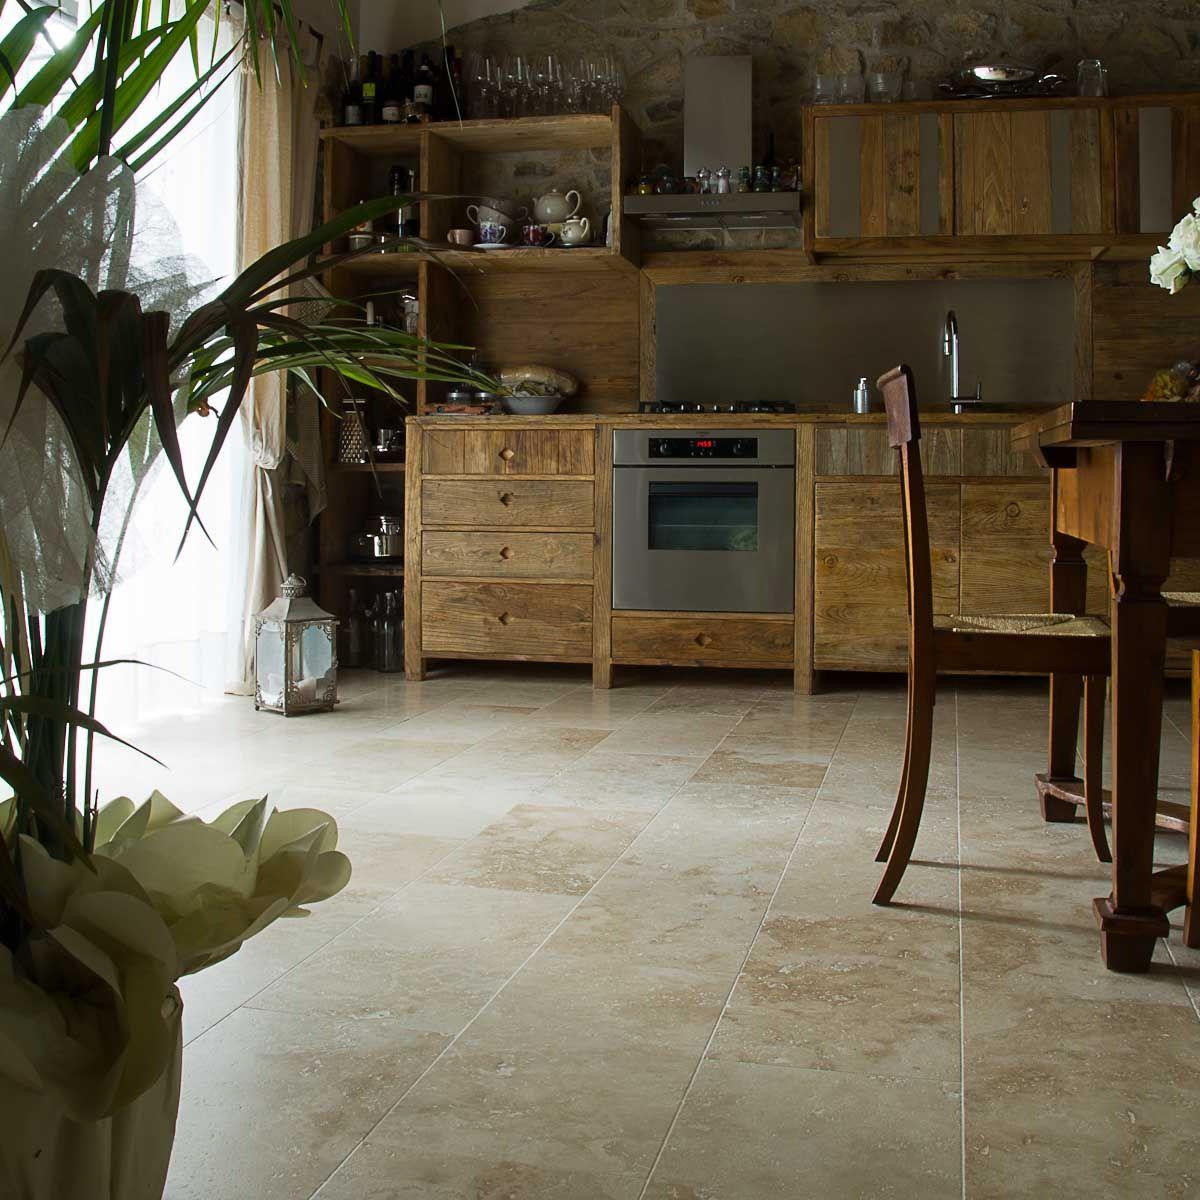 Casa colonica nella campagna toscana a impruneta for Cucina a bovindo